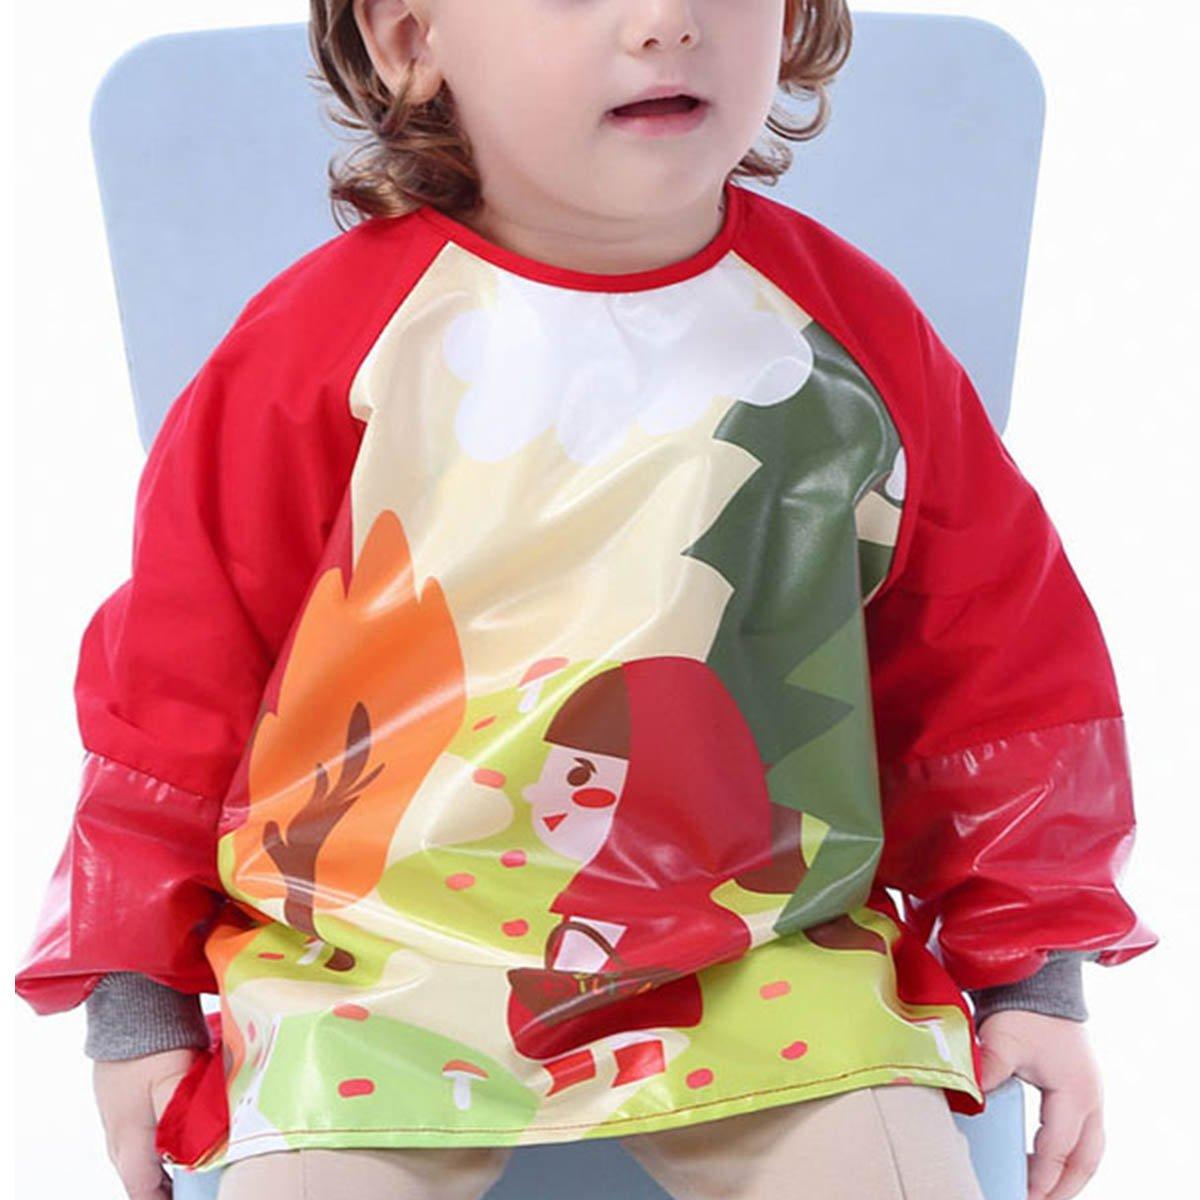 Dinosaurio - M Delantal Blus/ón Babero Impermeable Infantil para pintar con mangas largas para Beb/és ni/ños ni/ñas 1-2 a/ños Happy Cherry